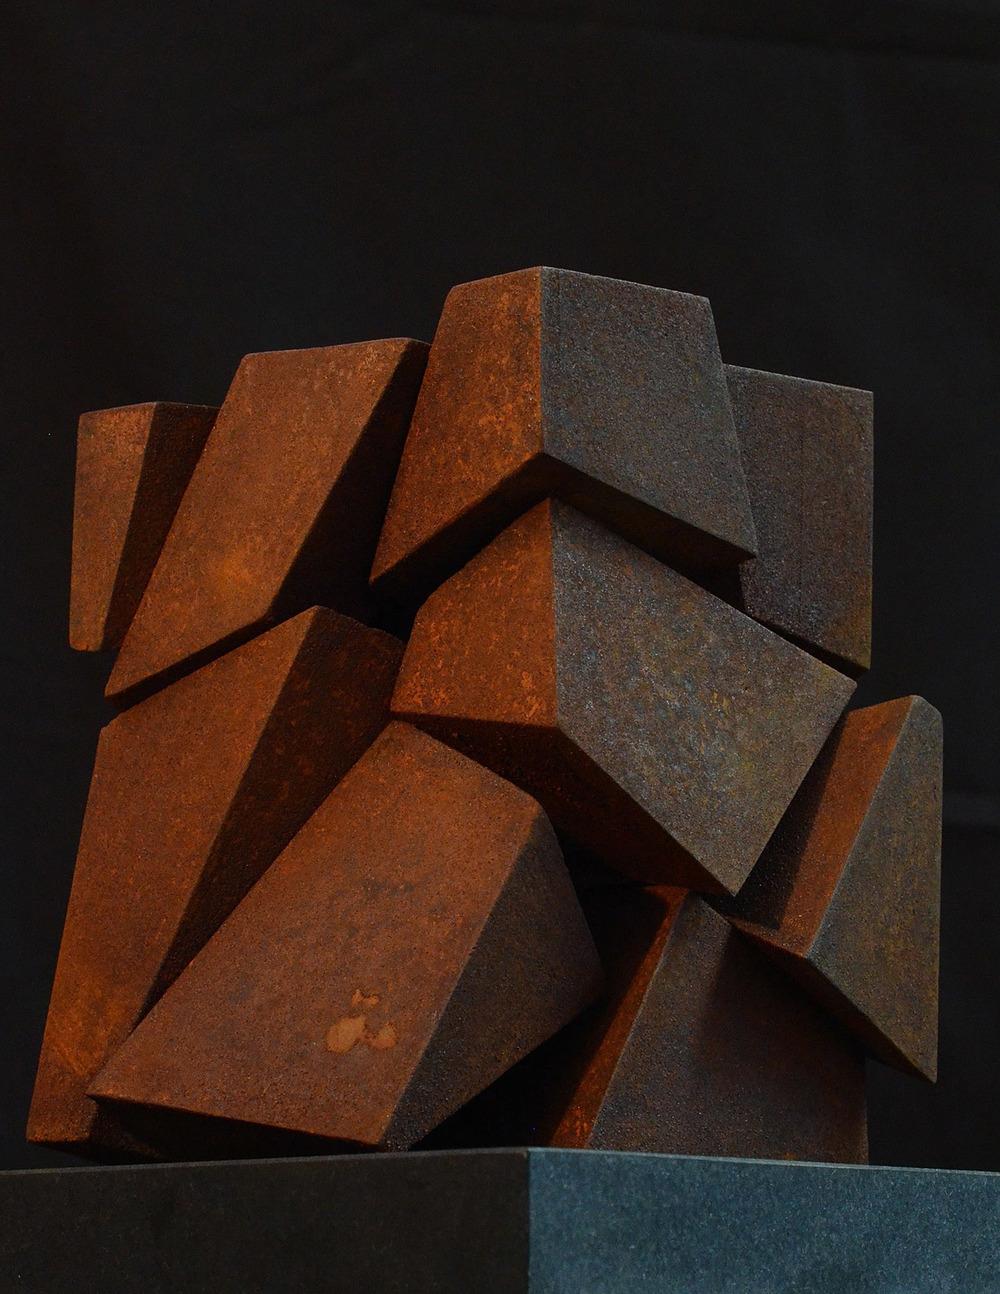 segmented-prism-401.jpg